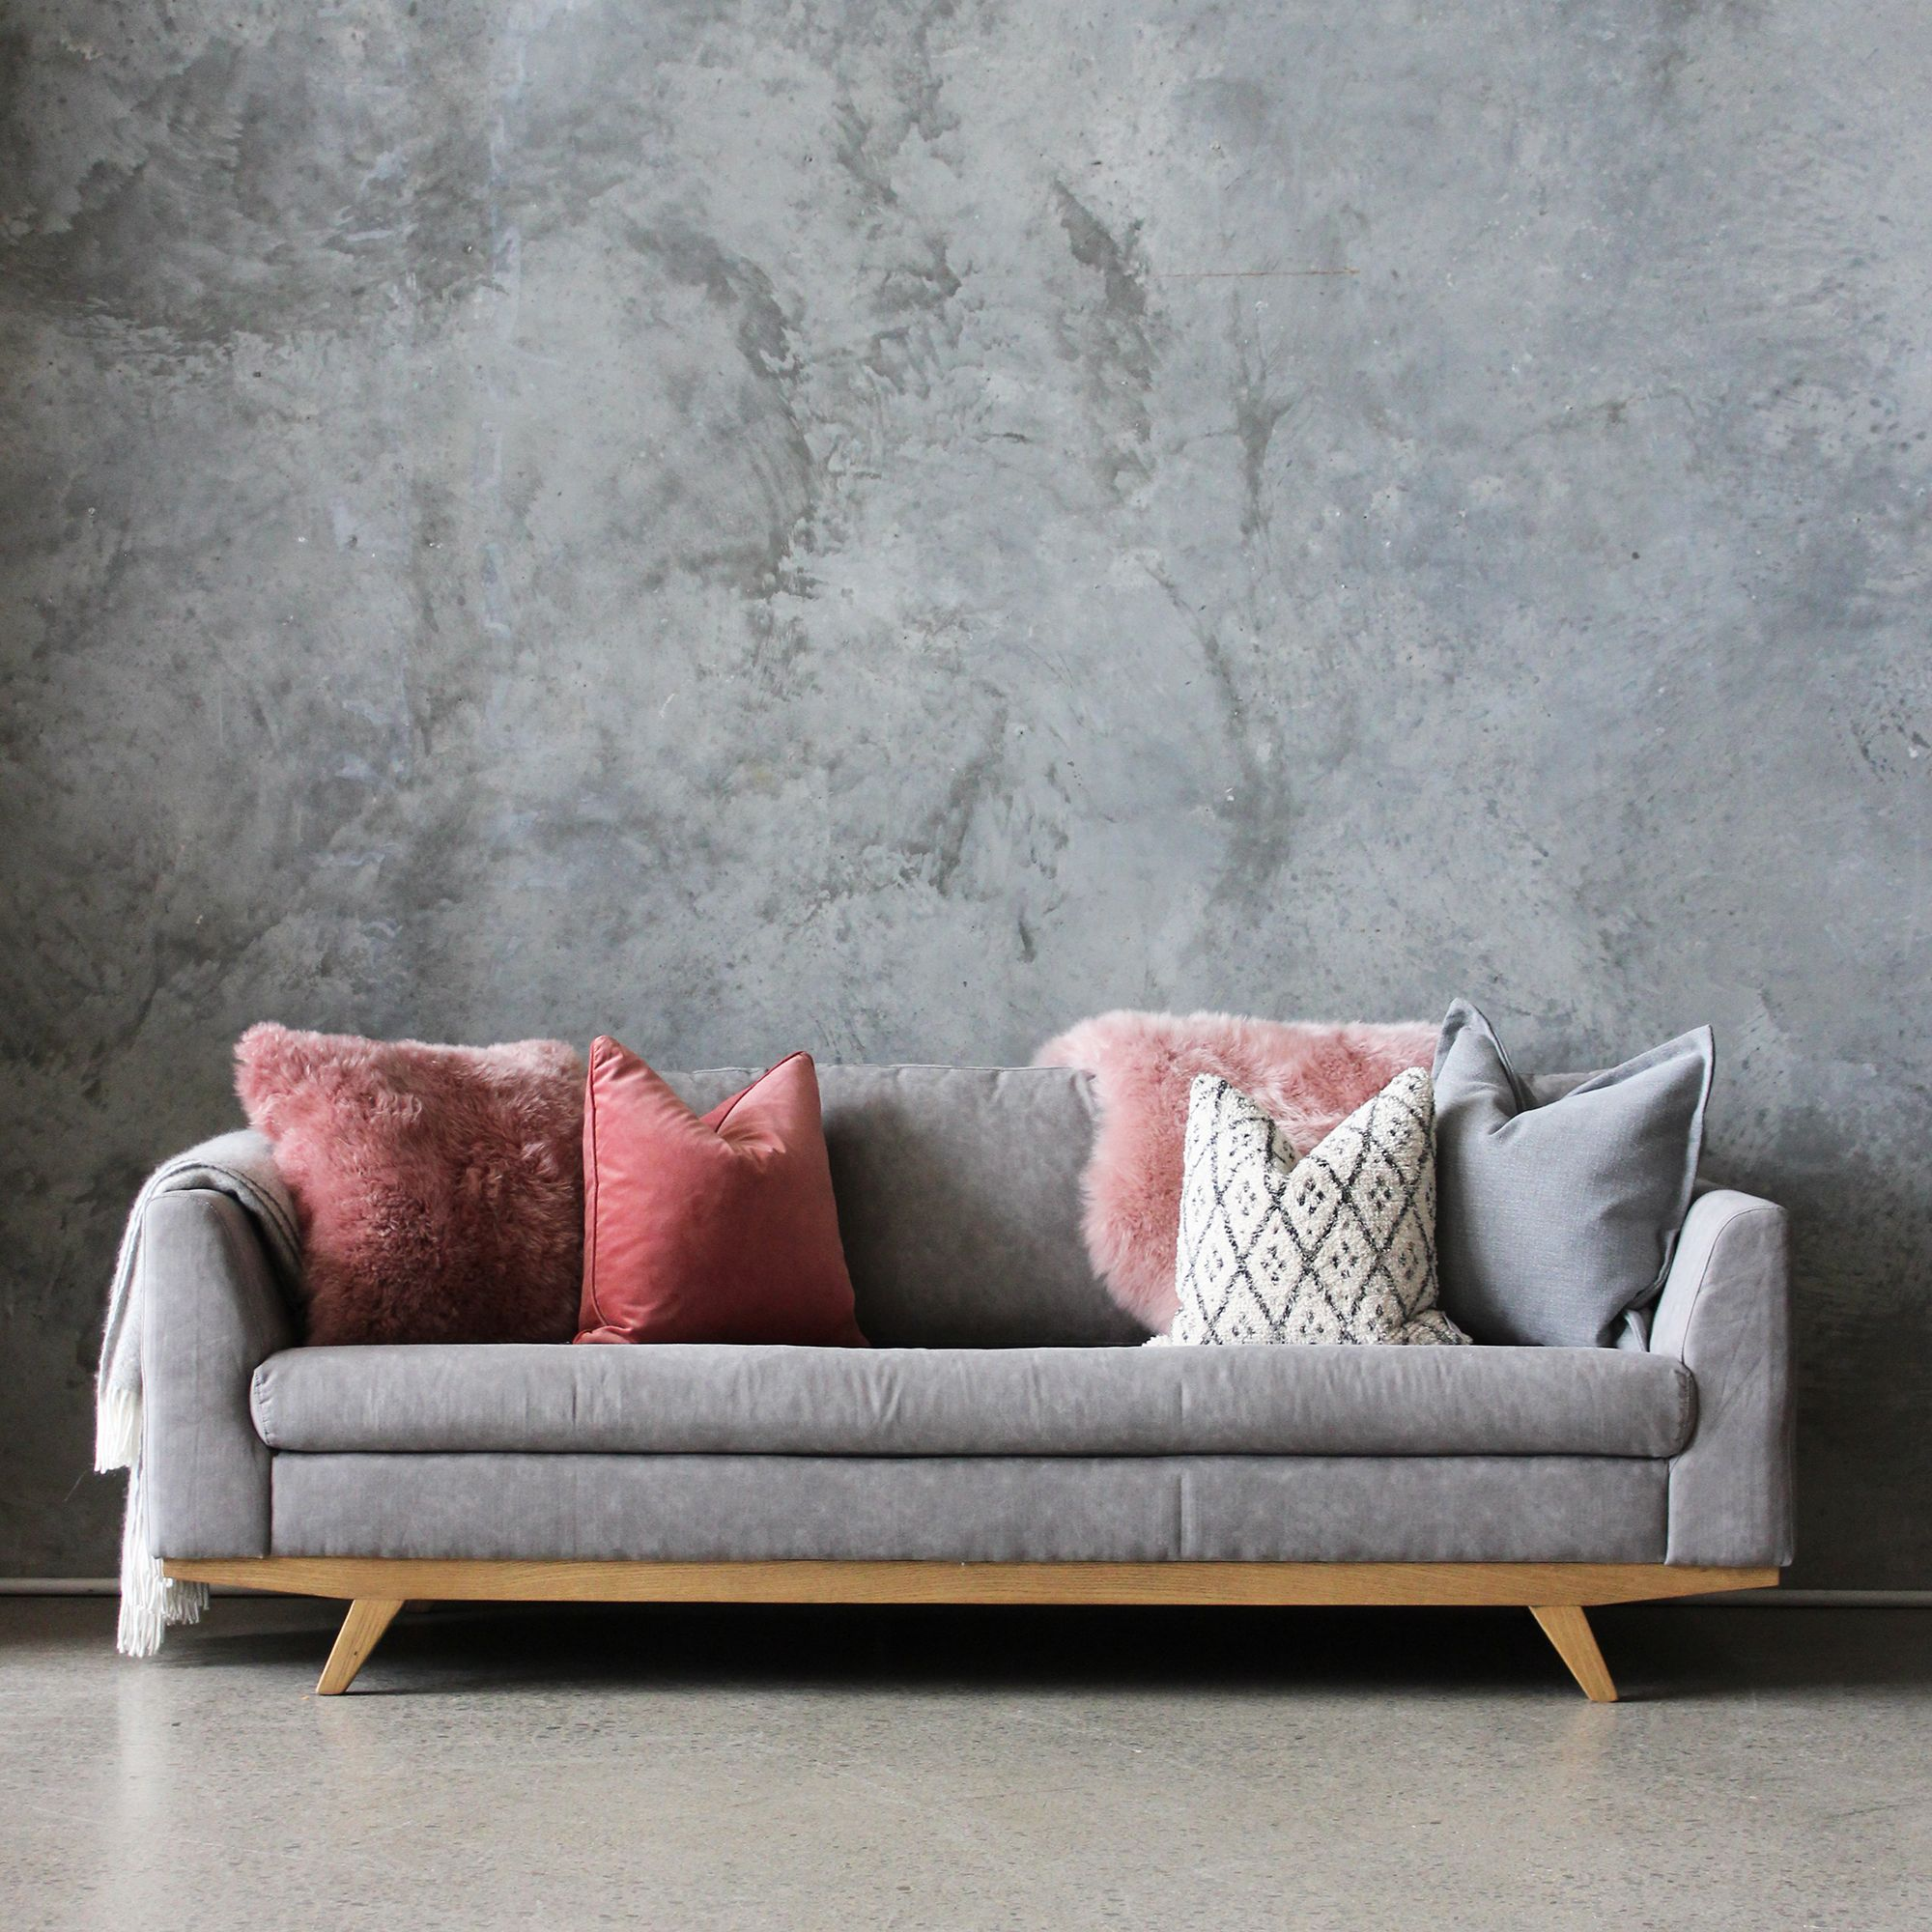 Chicago Sofa — Loft Furniture New Zealand | Loft furniture ...